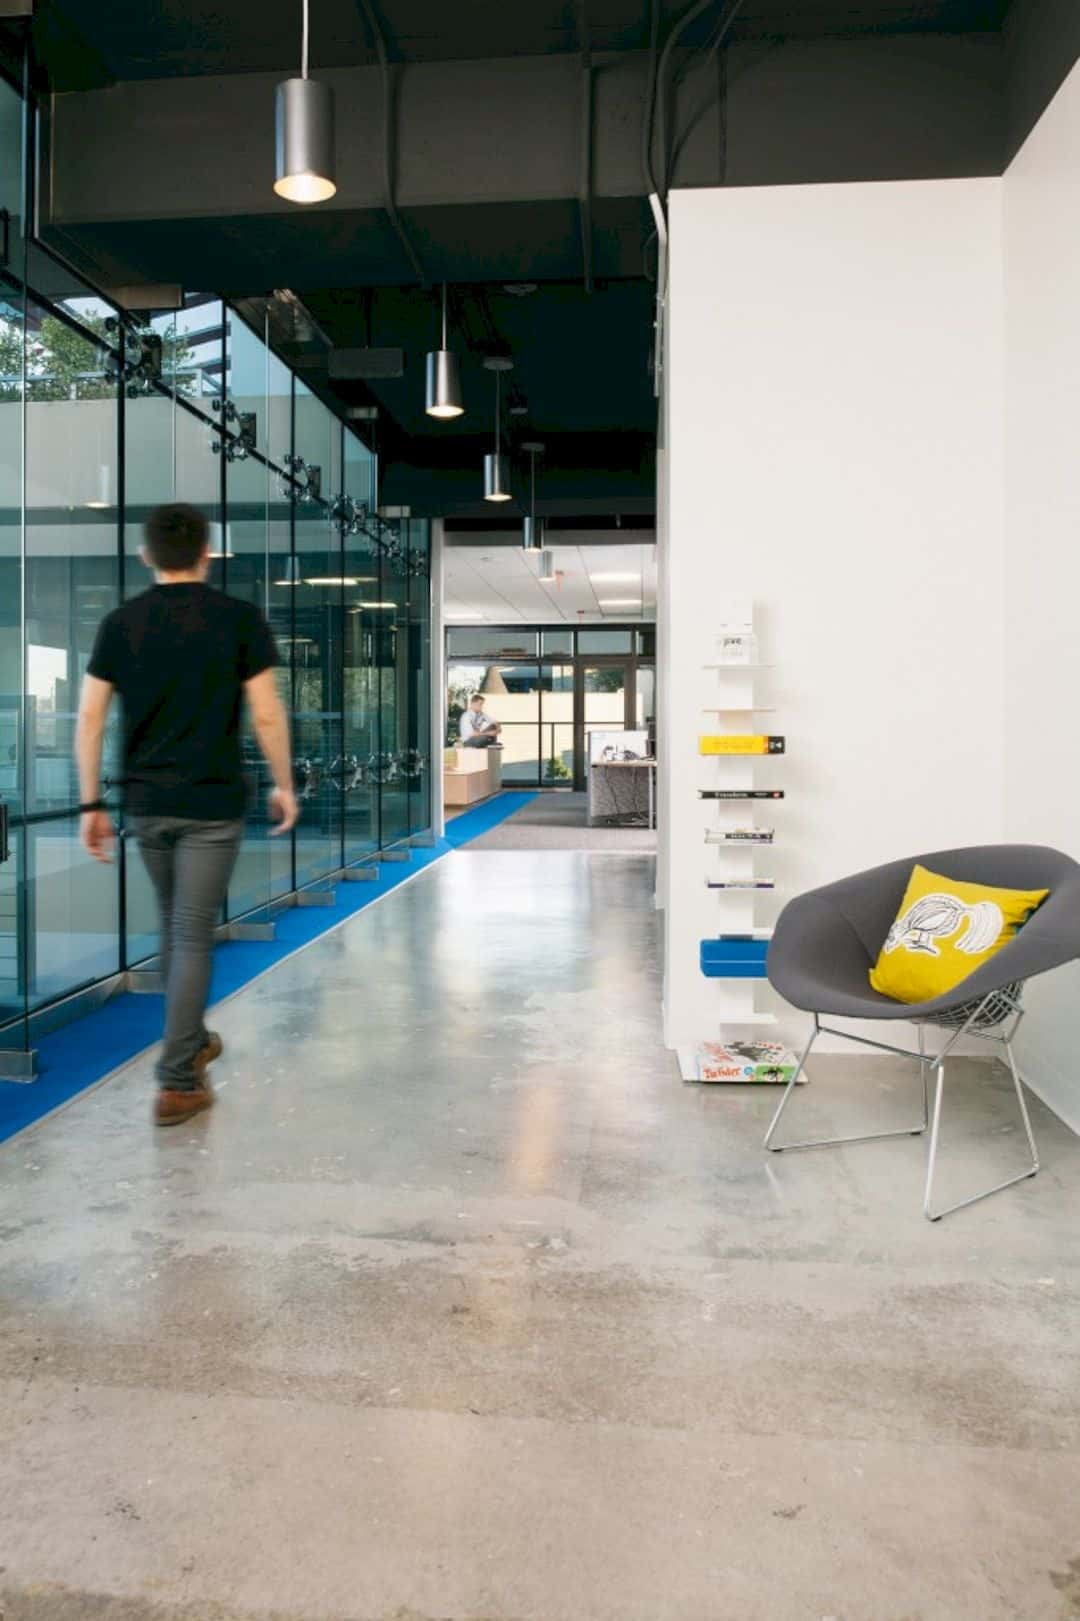 17 Minimalist Home Interior Design Ideas